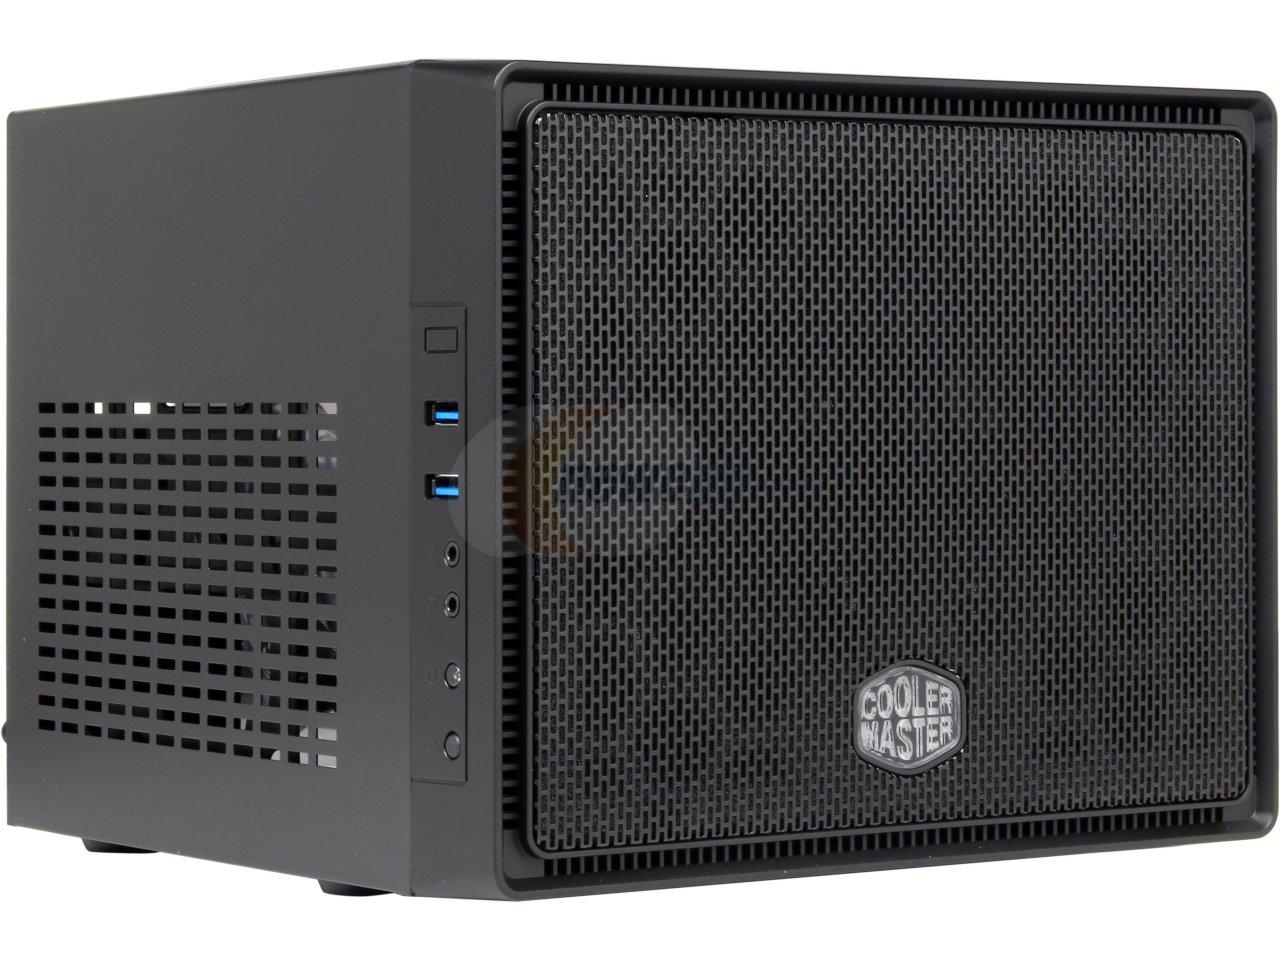 Cooler Master Elite 110 mini_ITX Case $30AR@Newegg